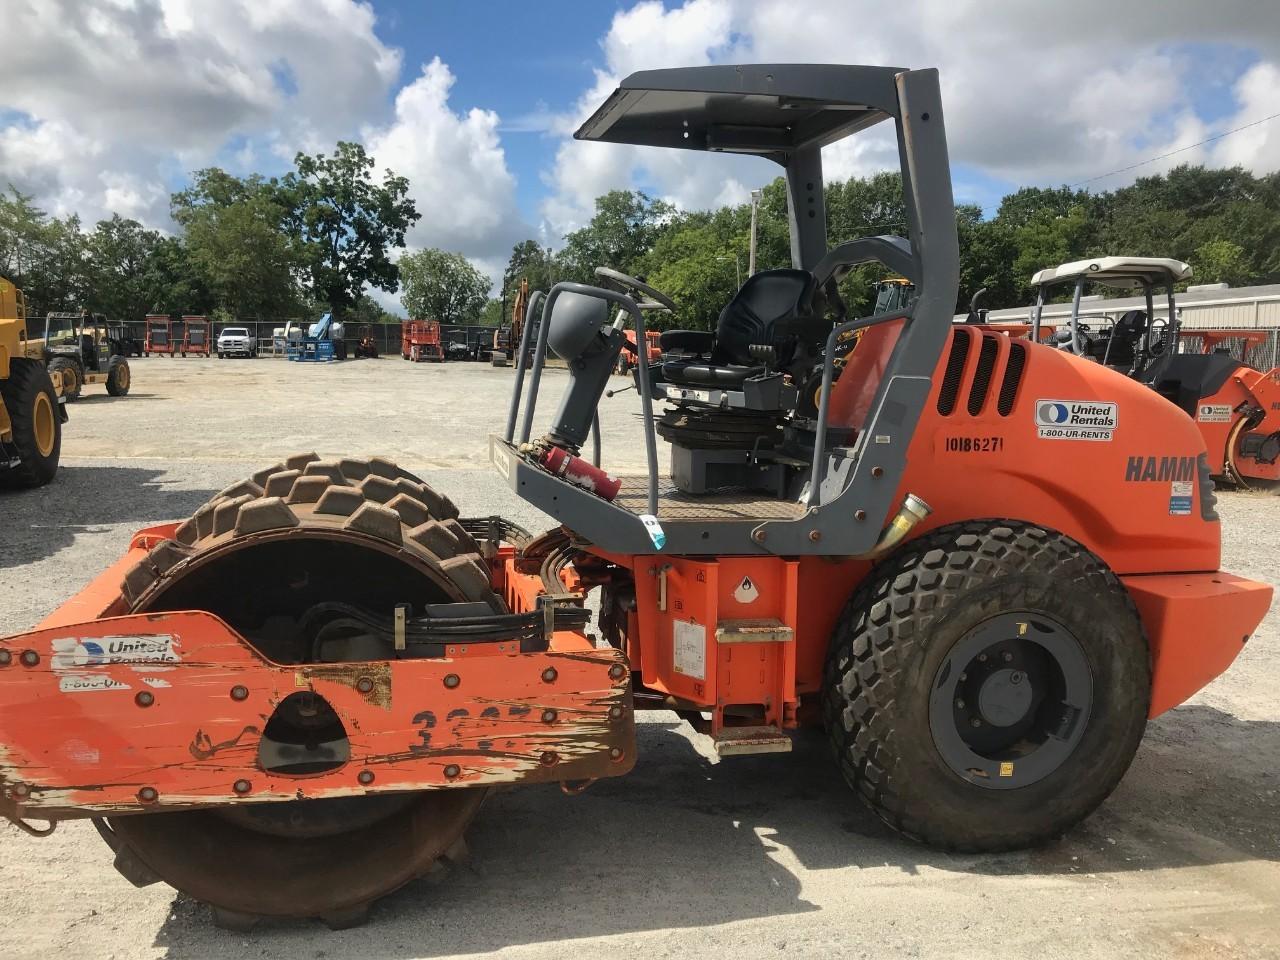 Alabama - Equipment For Sale - Equipment Trader